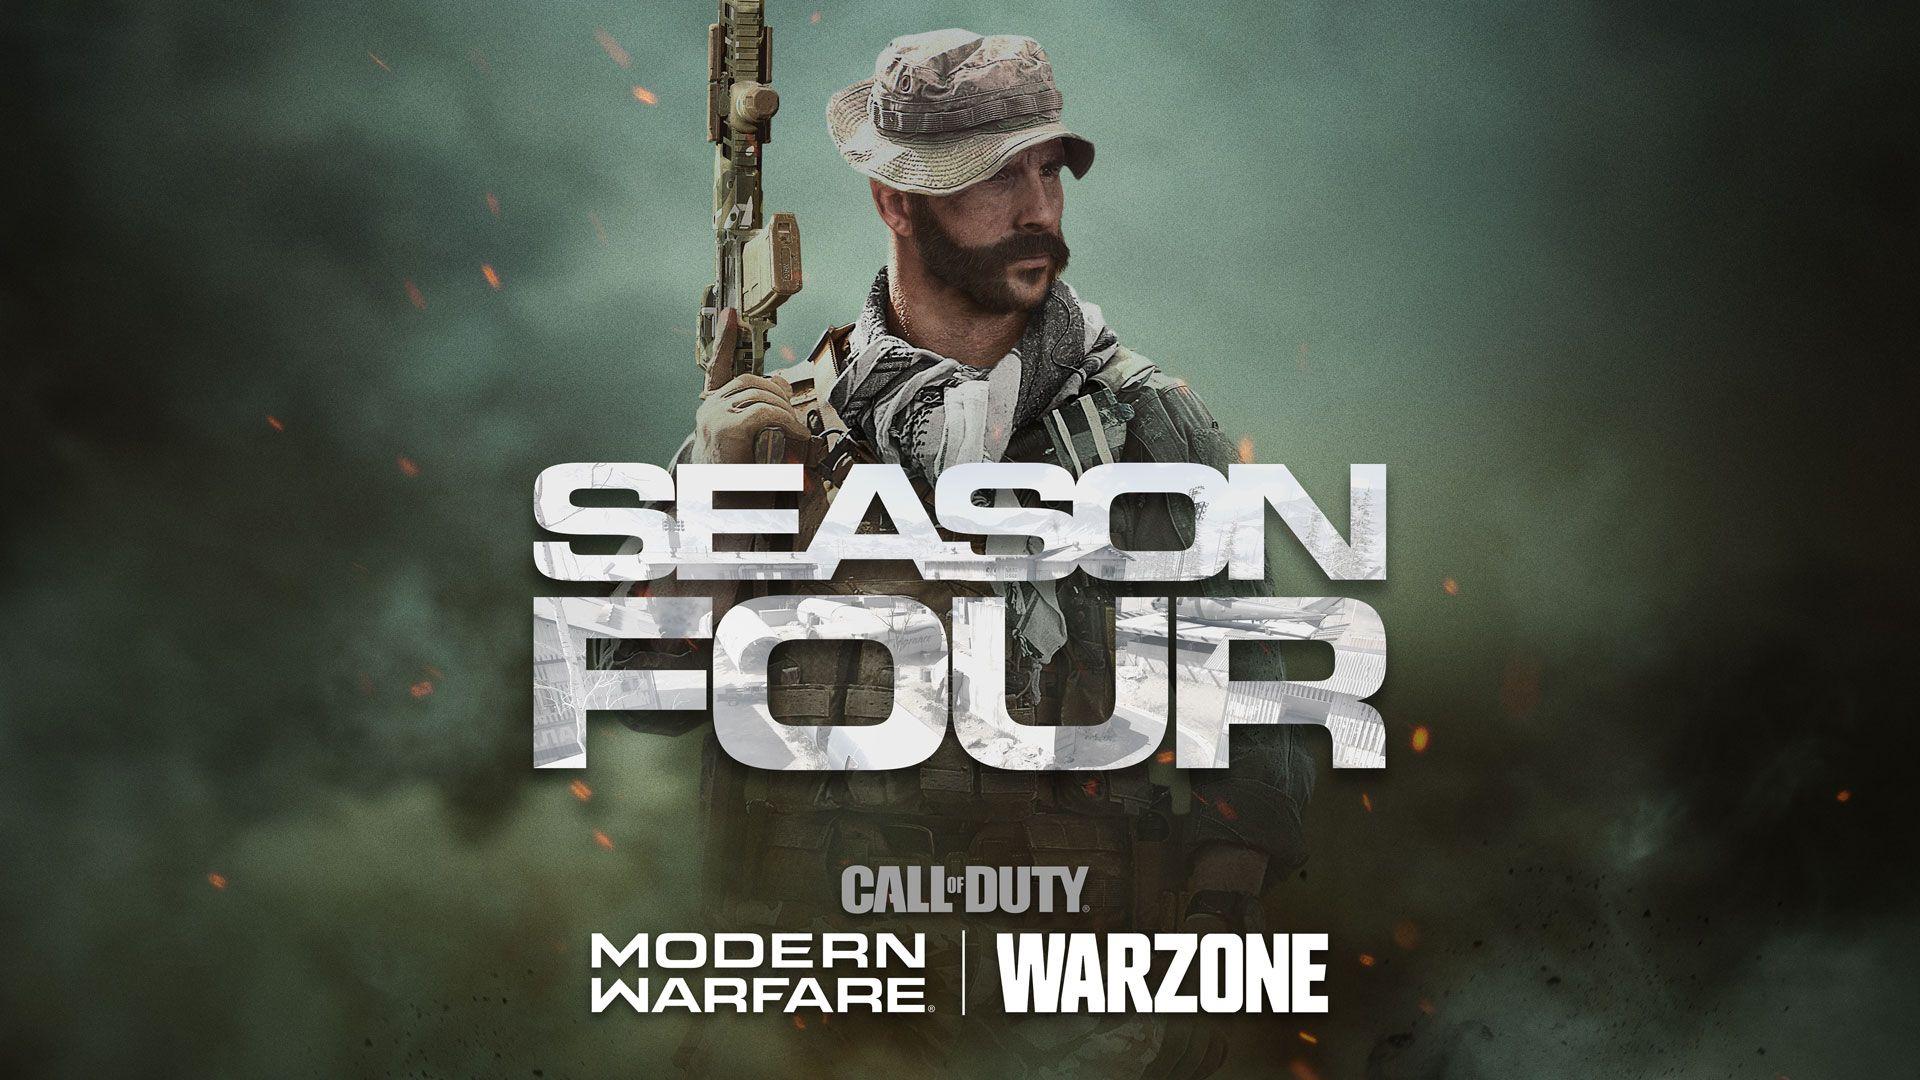 Call of Duty: Modern Warfare Backend